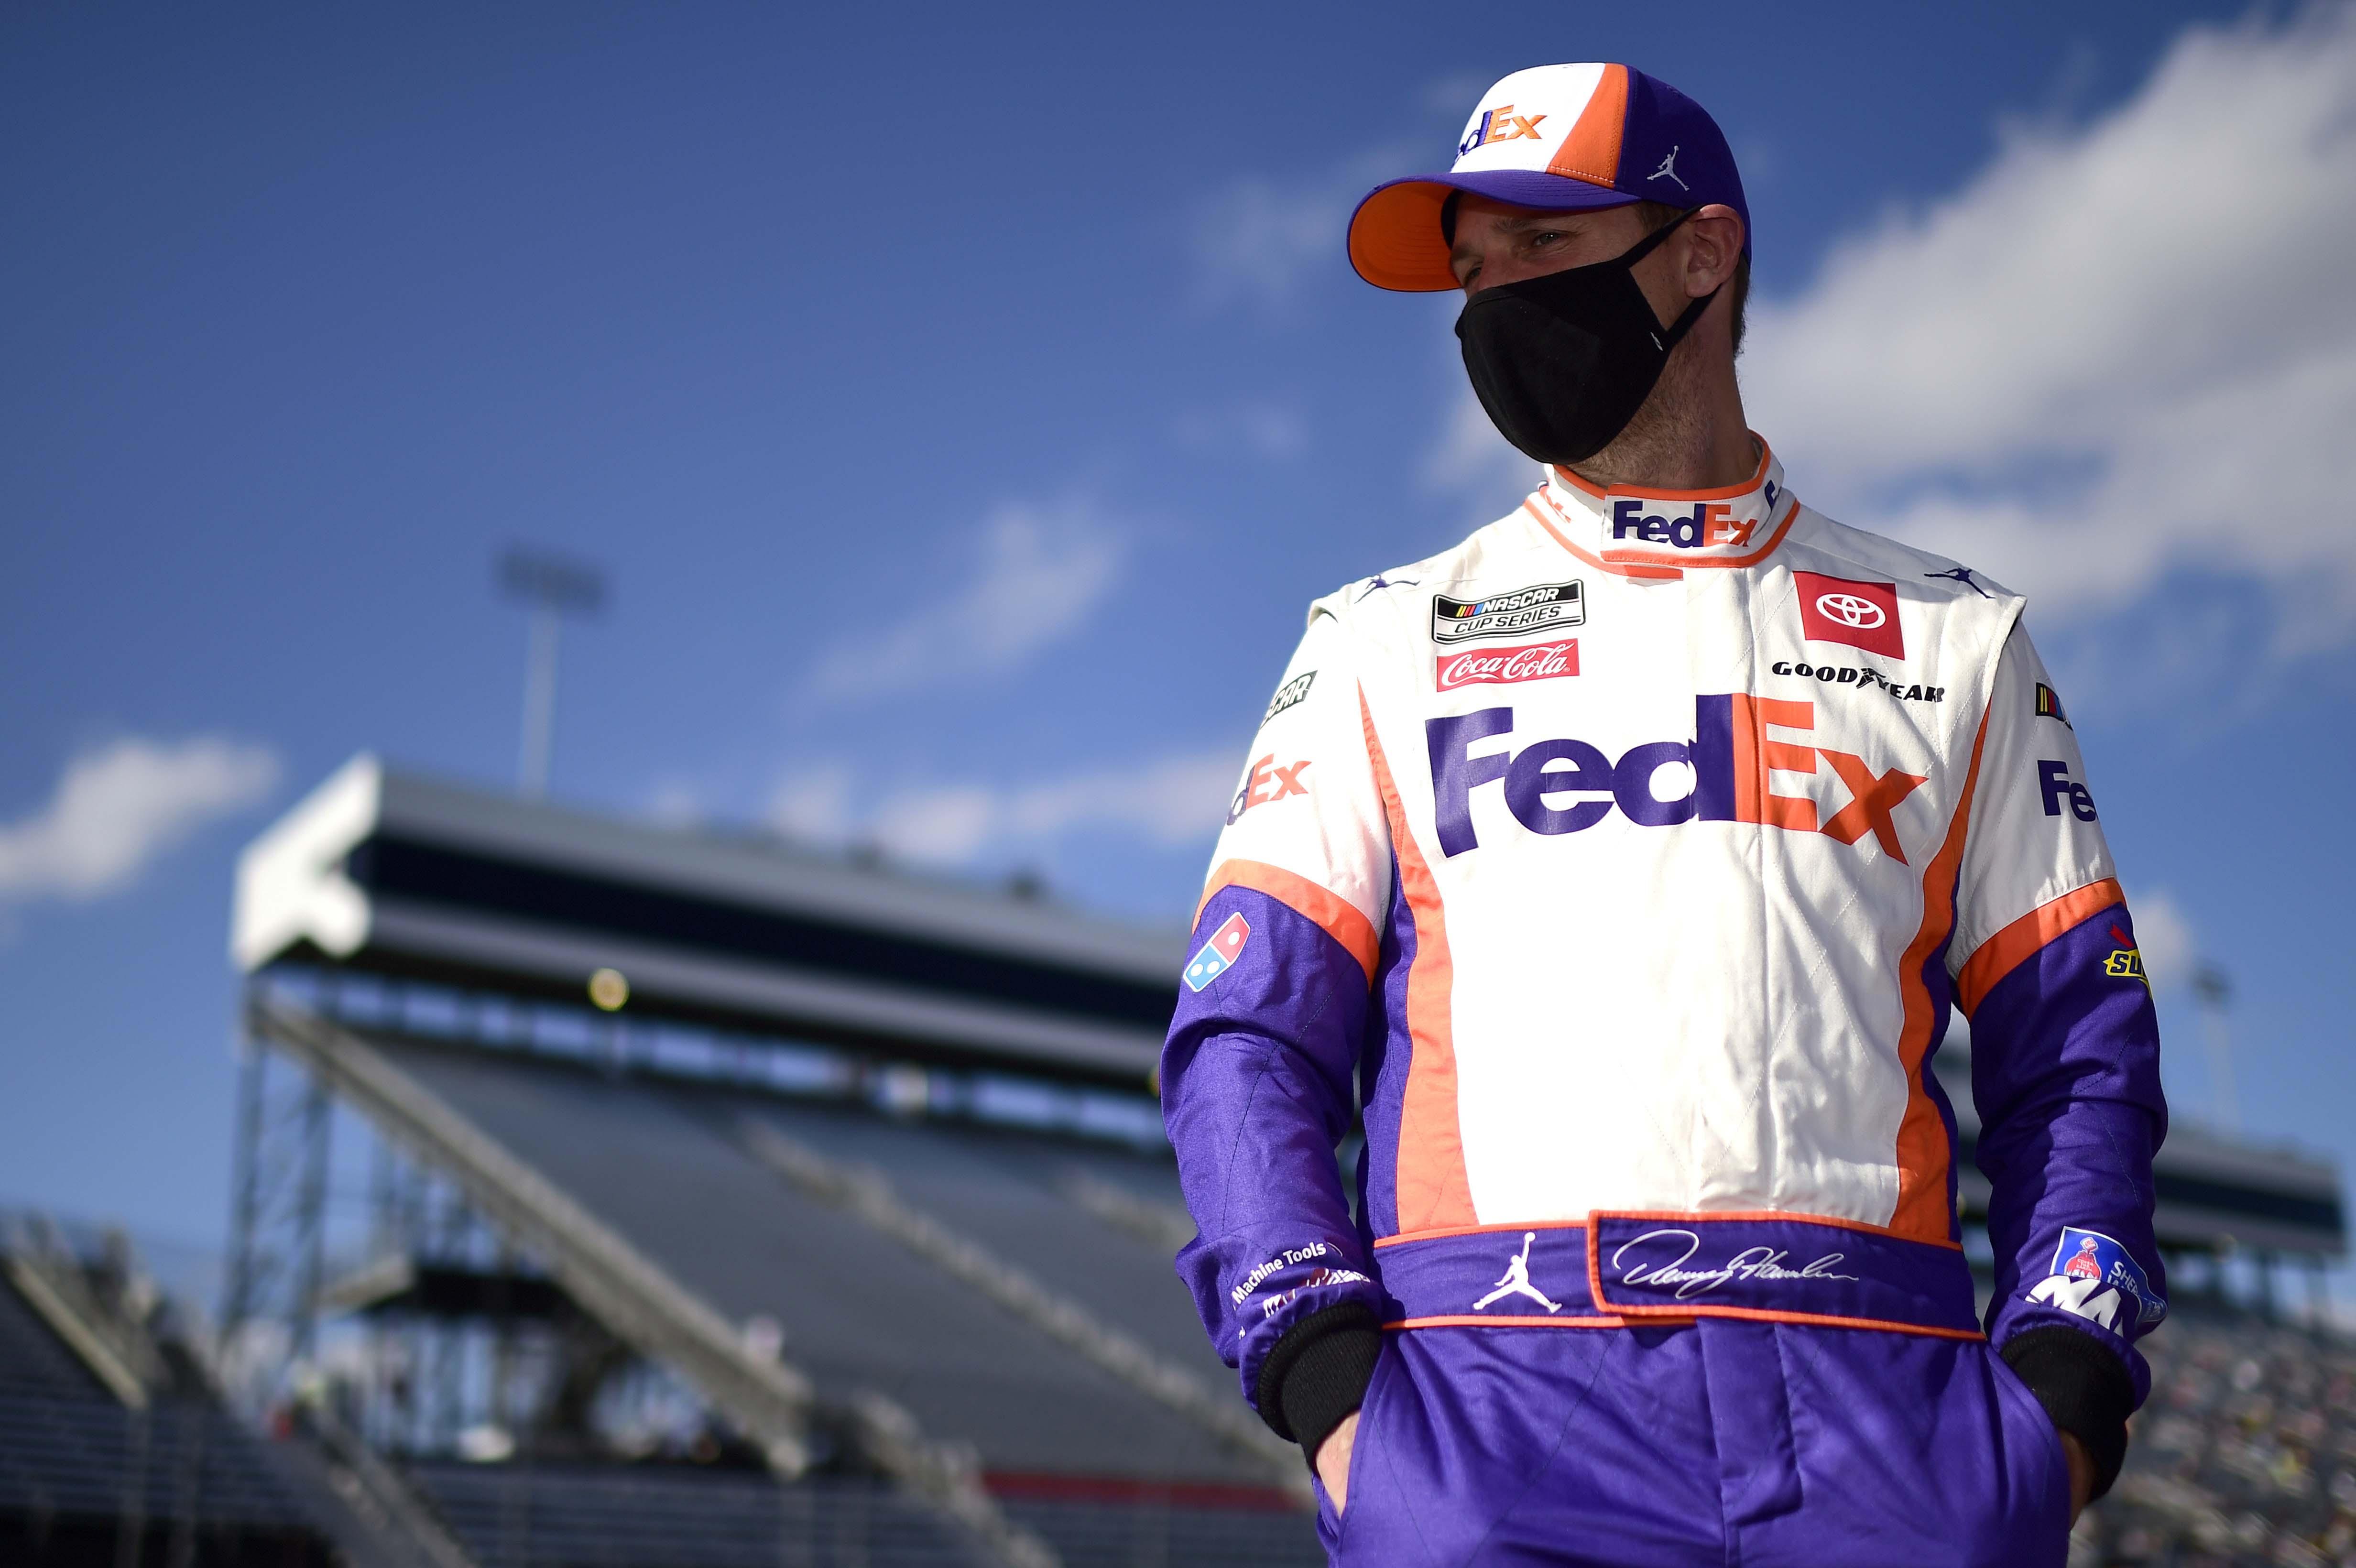 Denny Hamlin - NASCAR driver